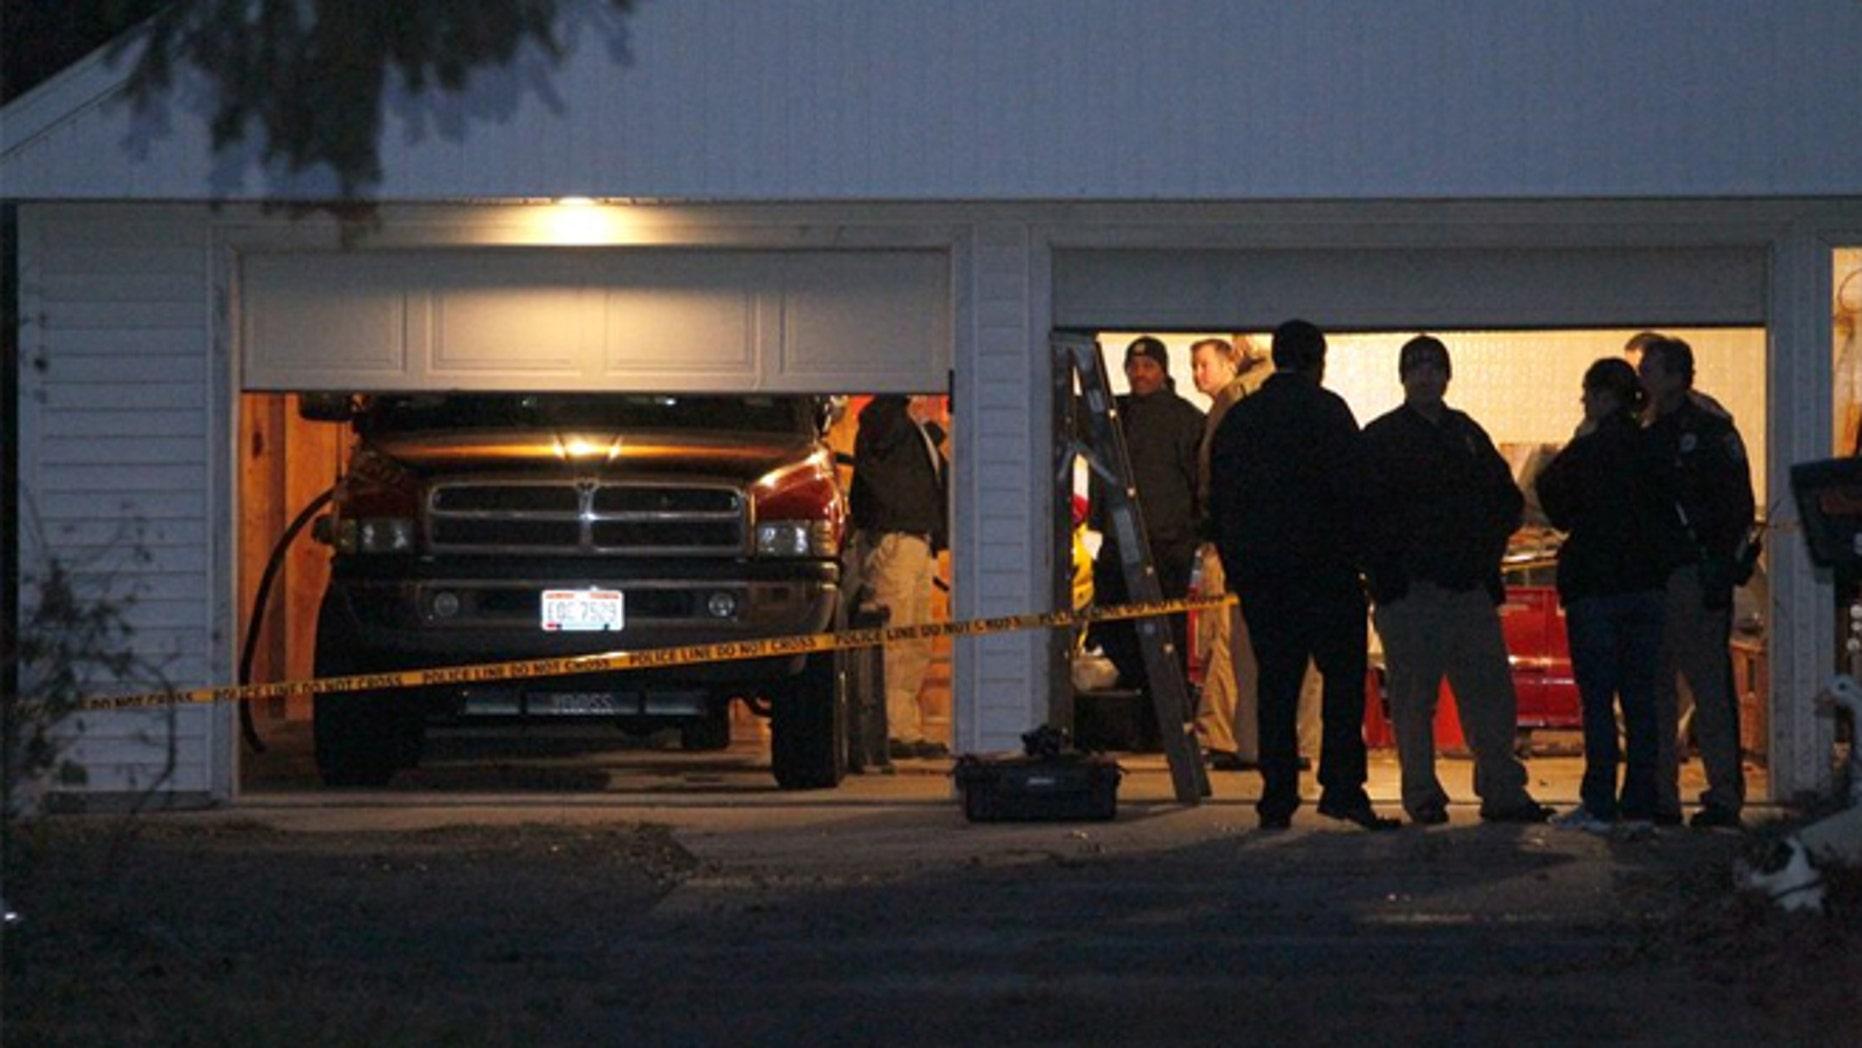 Nov. 12: Authorities respond to a report of carbon monoxide poisoning on Harvest Lane in Toledo, Ohio.